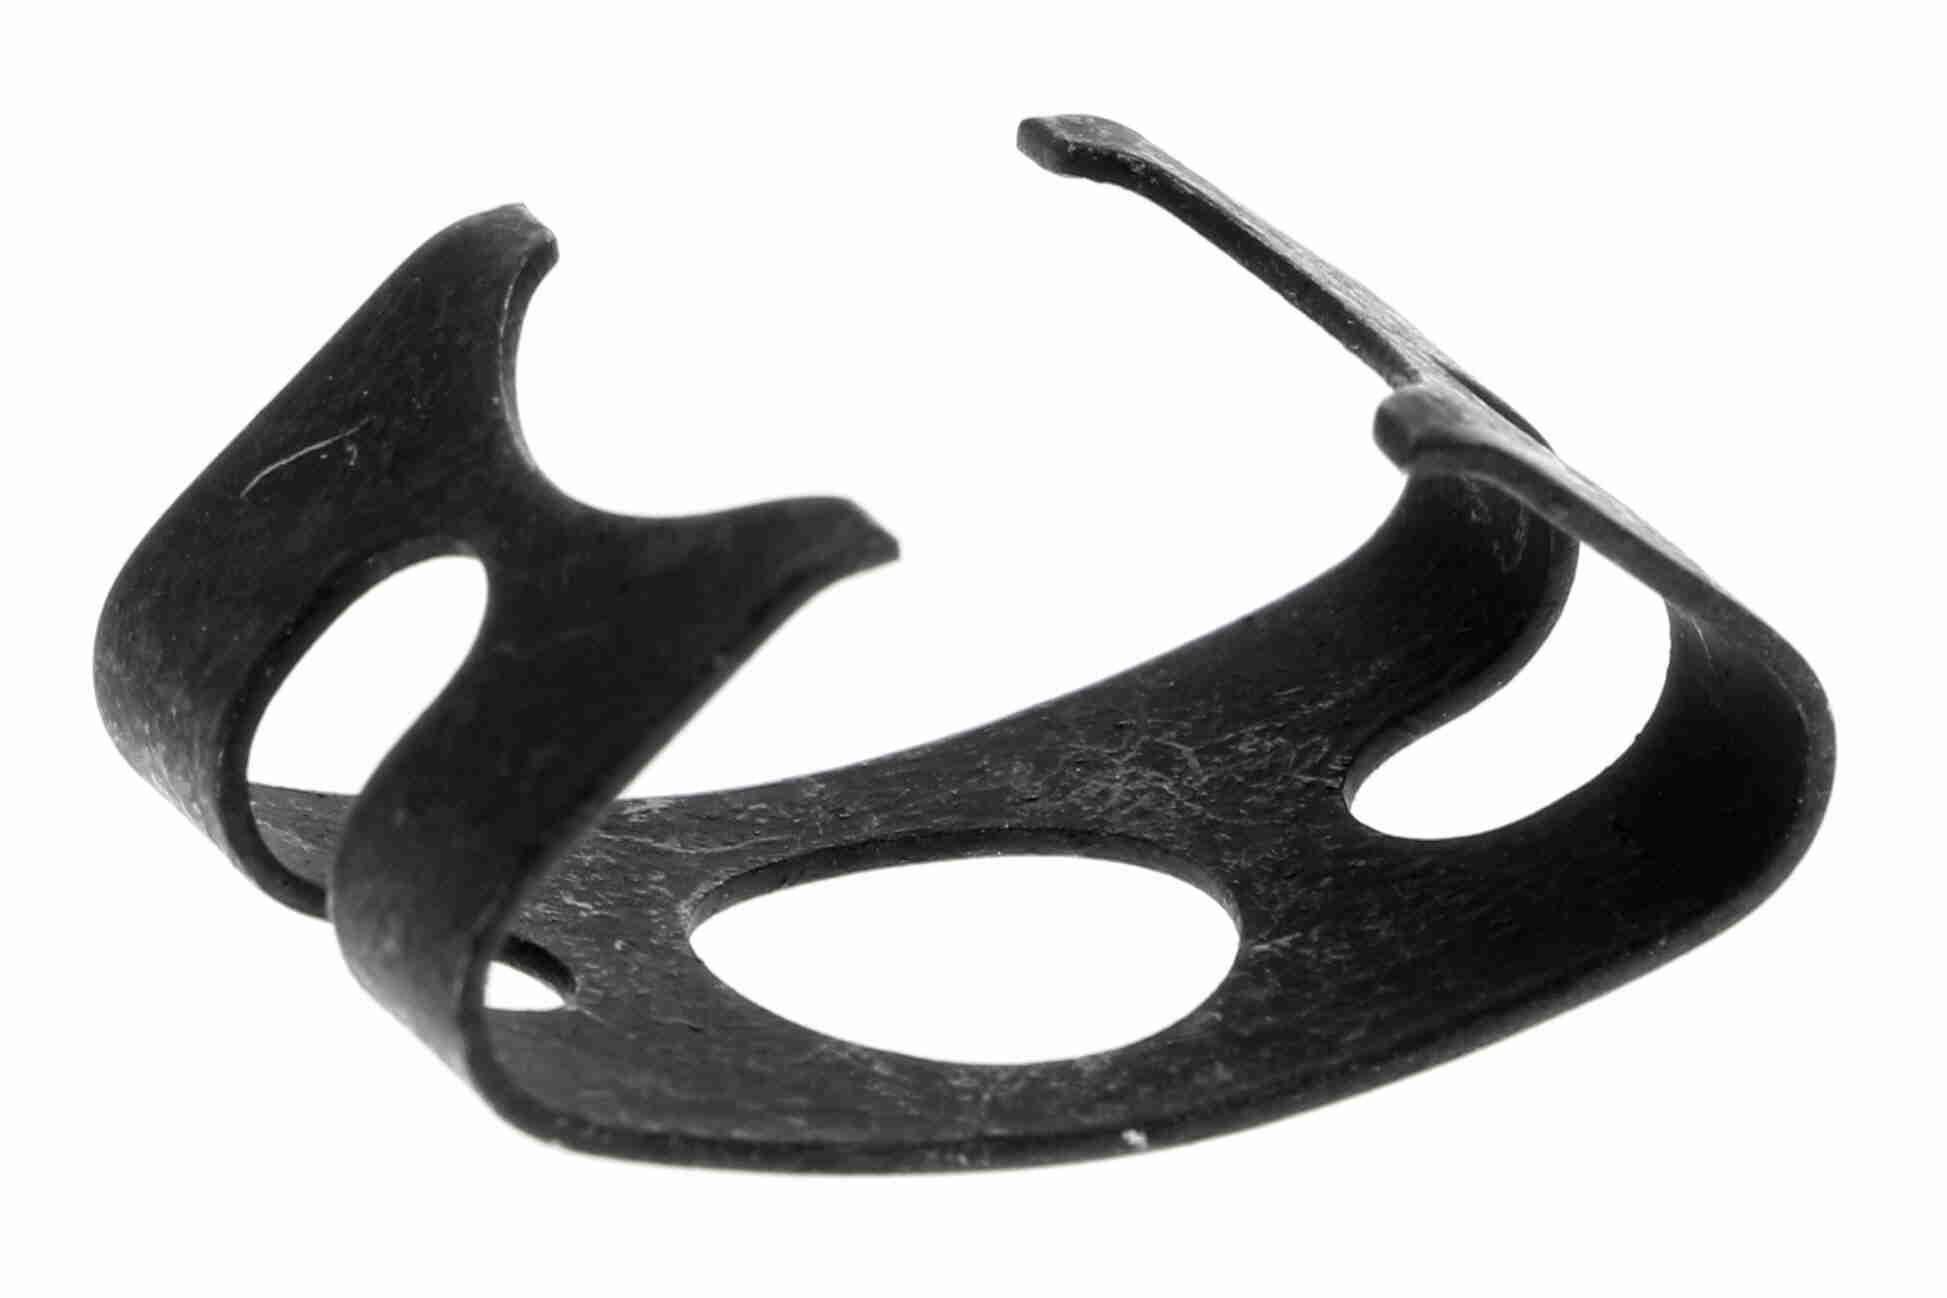 VW AMAROK 2019 Bremsschlauch - Original VAICO V10-3131